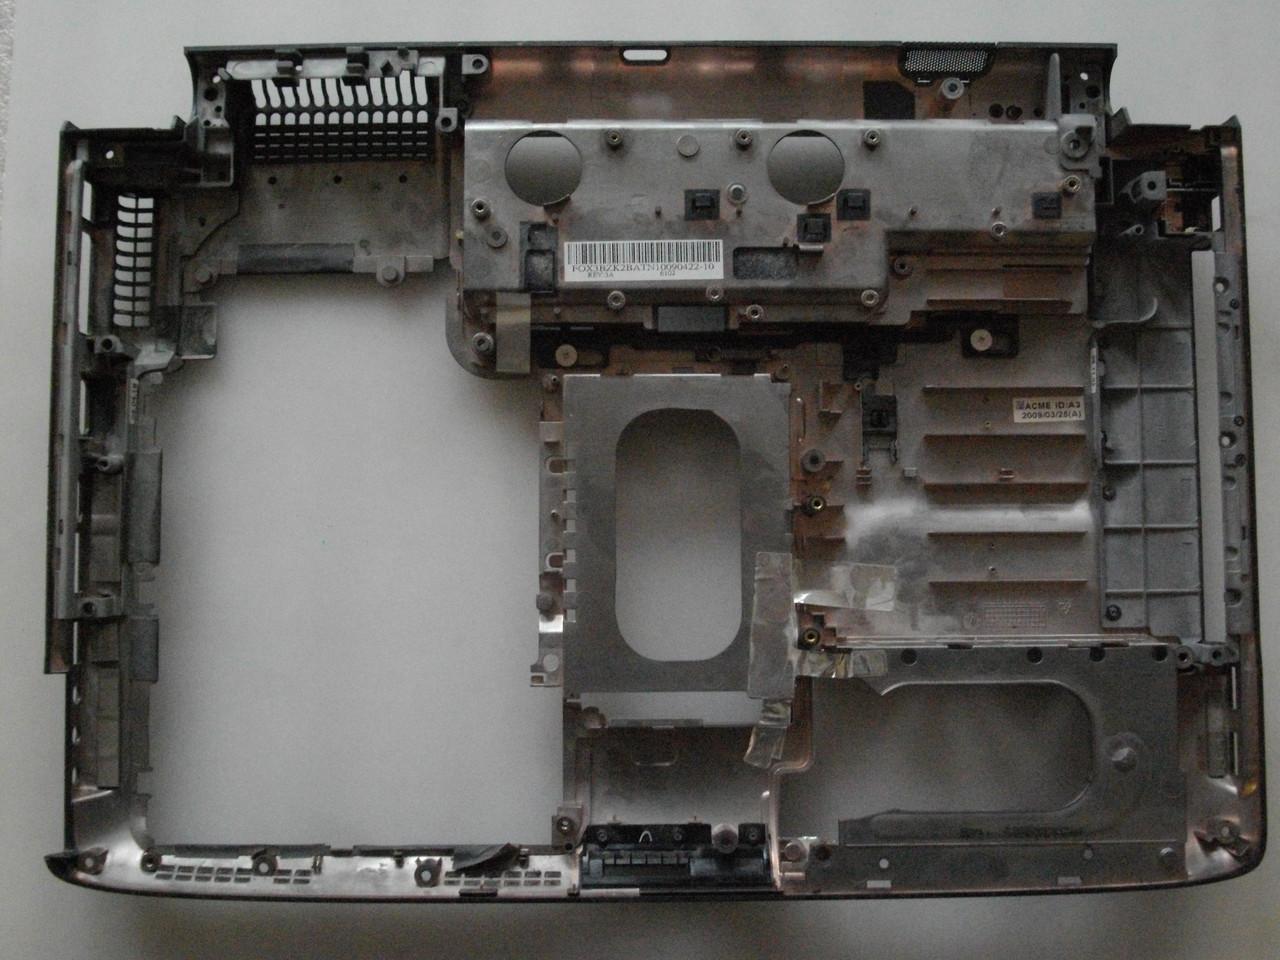 Корпус низ Нижня частина корпусу Acer 6930, бо 6930Z